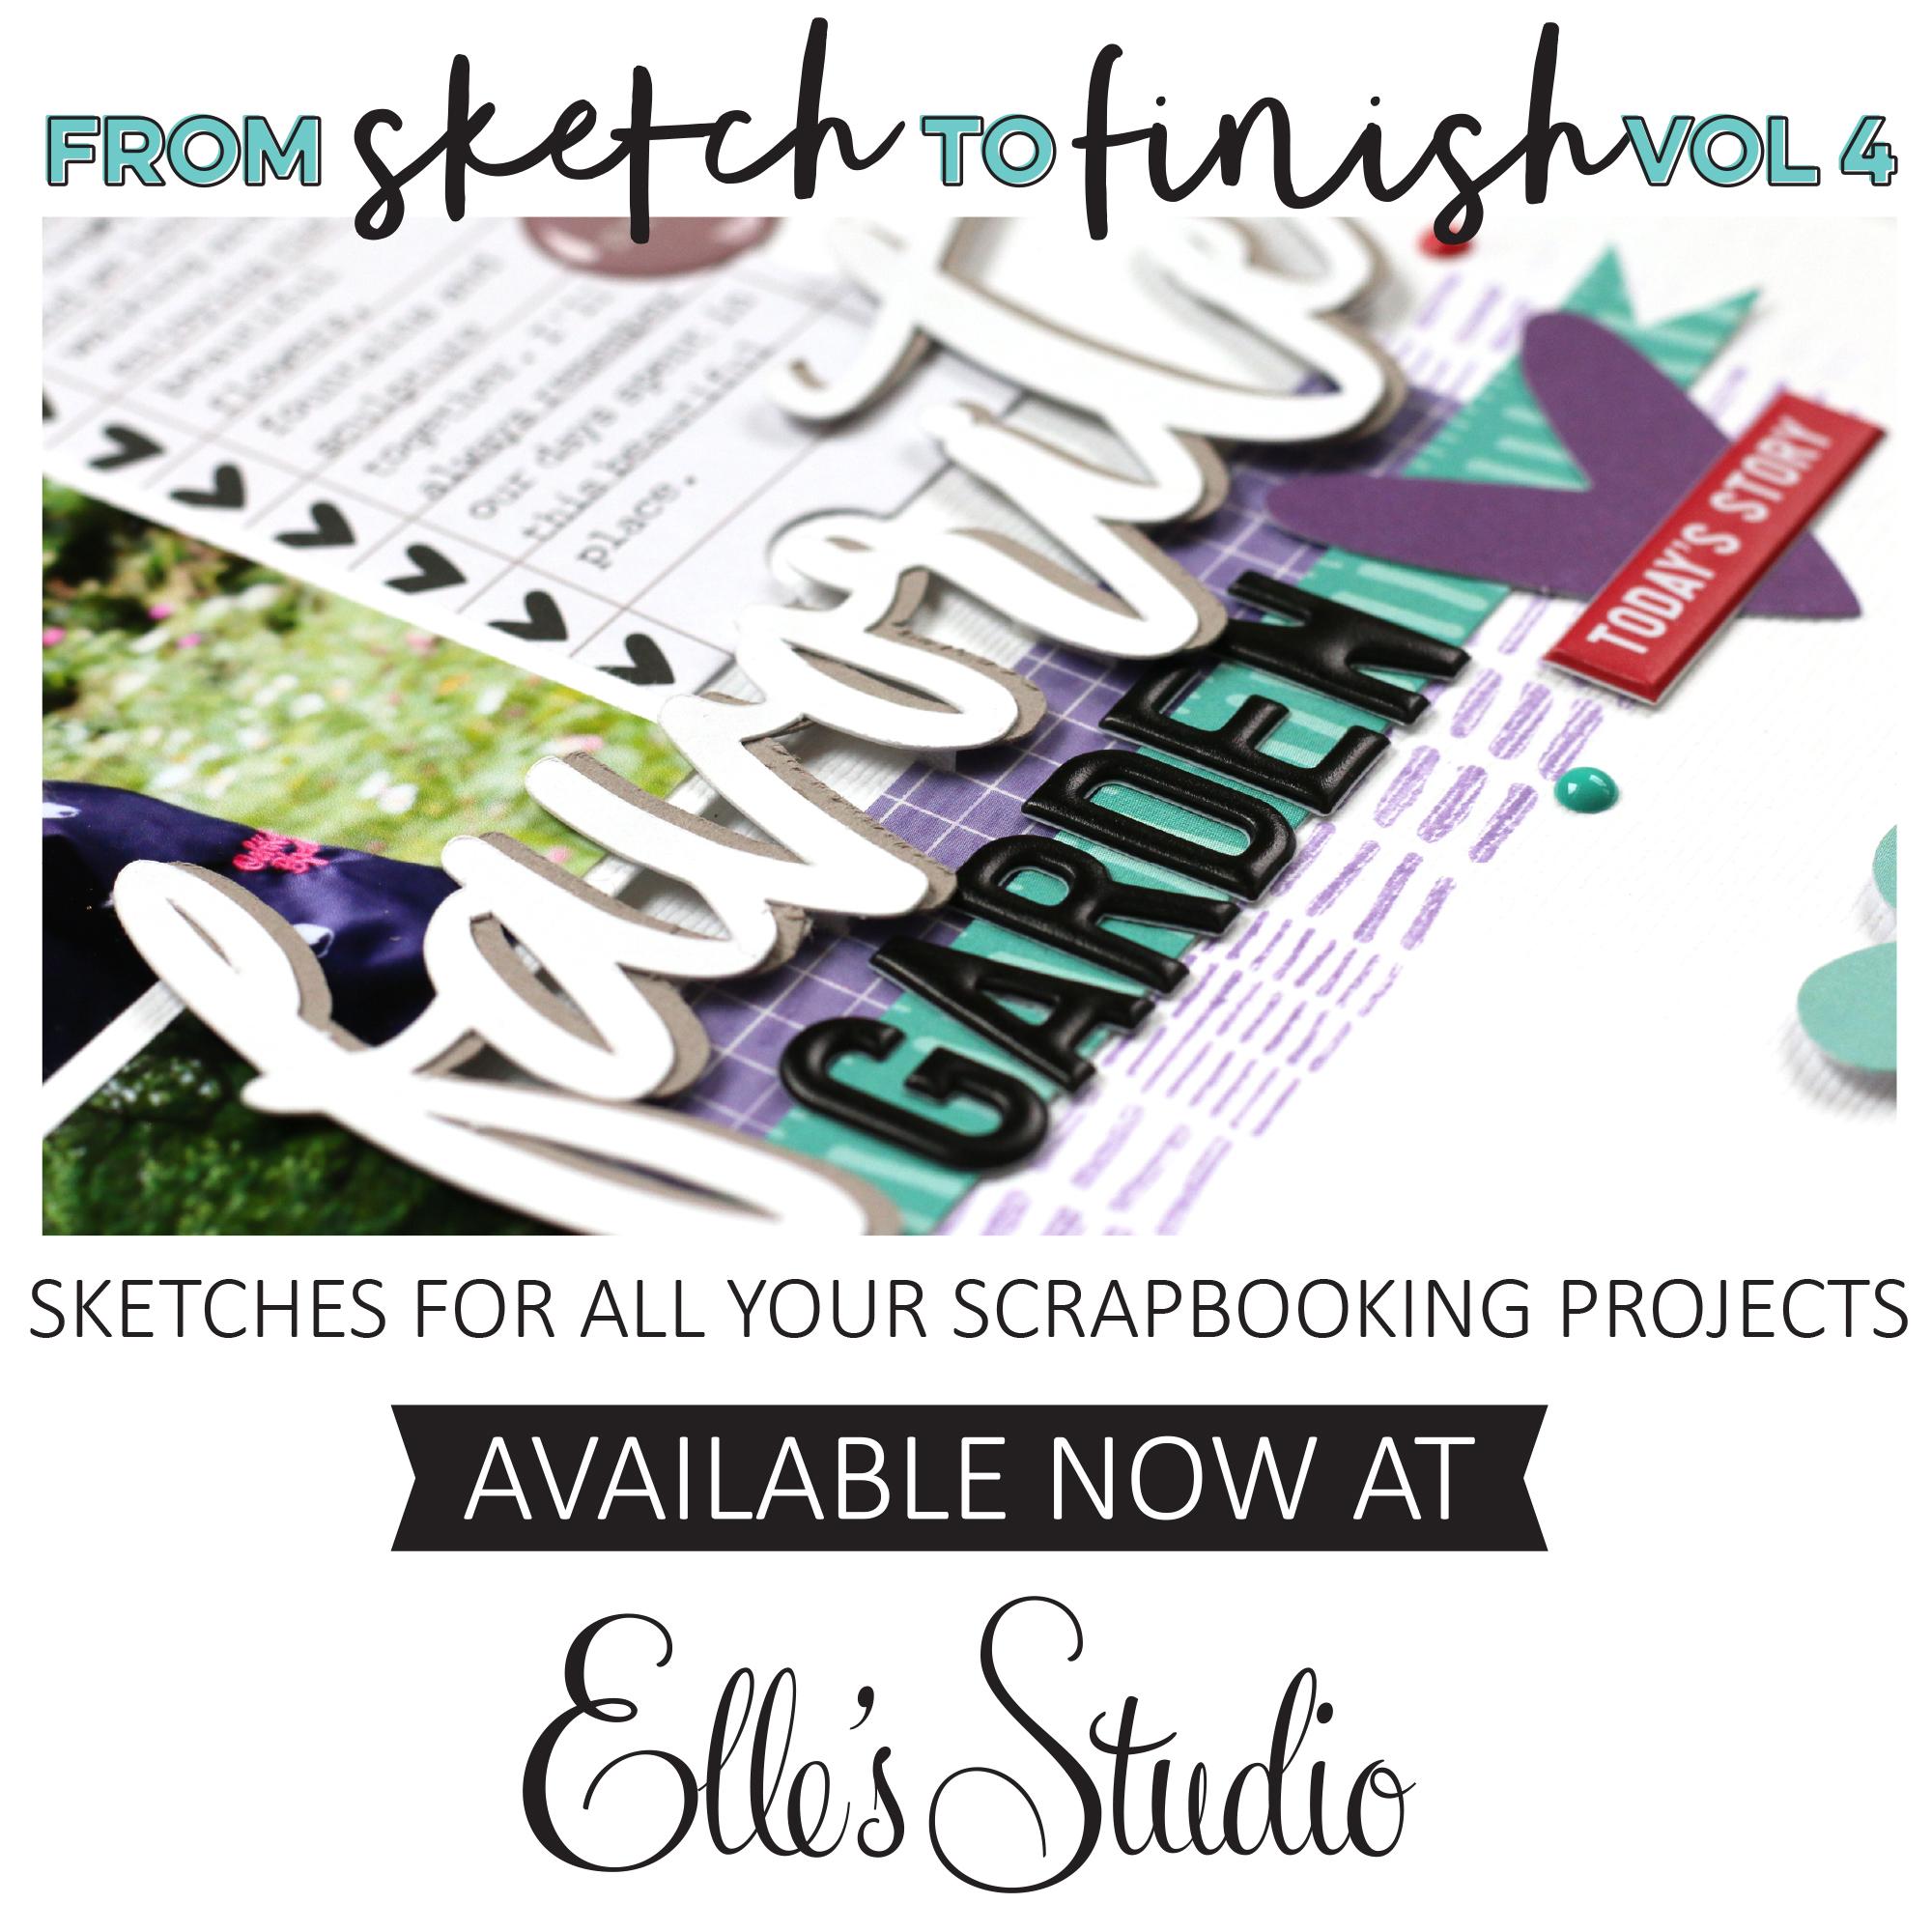 EllesStudio-FromSketchToFinishVol4-MeghannAndrew.jpg